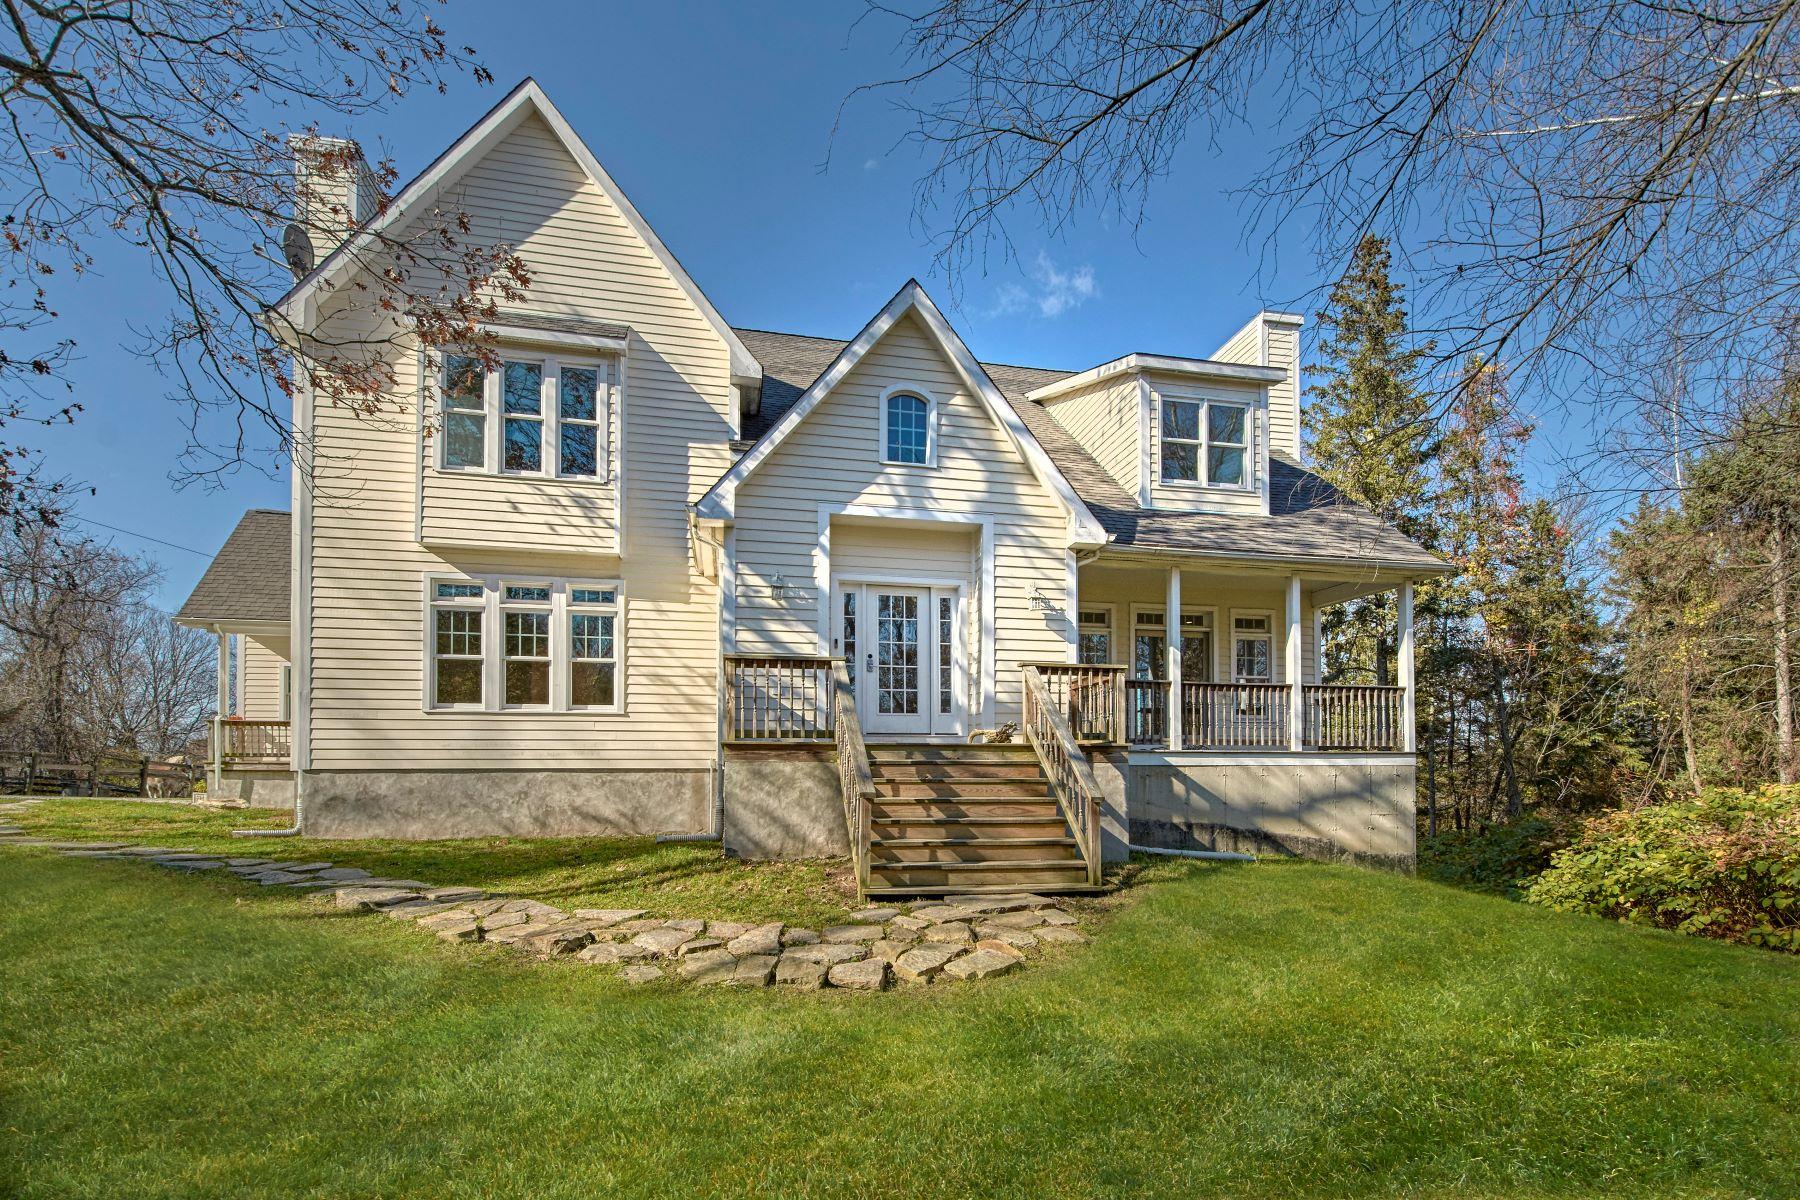 Single Family Homes for Sale at Hidden Gem! 42 Varna Lane Mahopac, New York 10541 United States